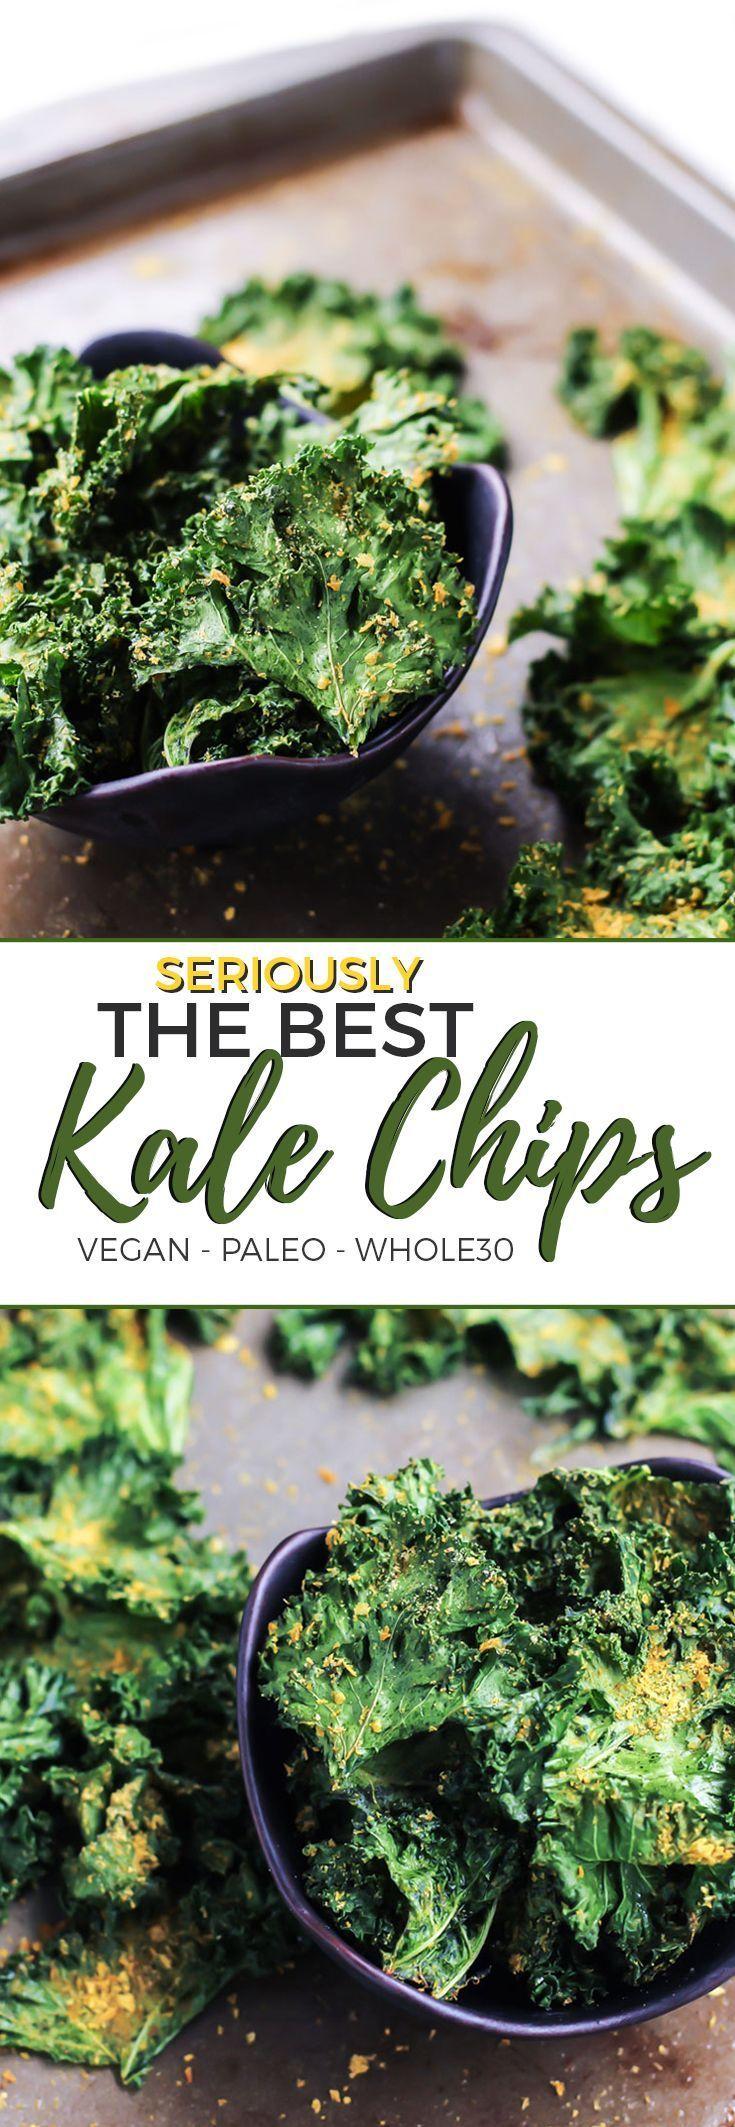 kale chips recipe pinterest The Best Kale Chips